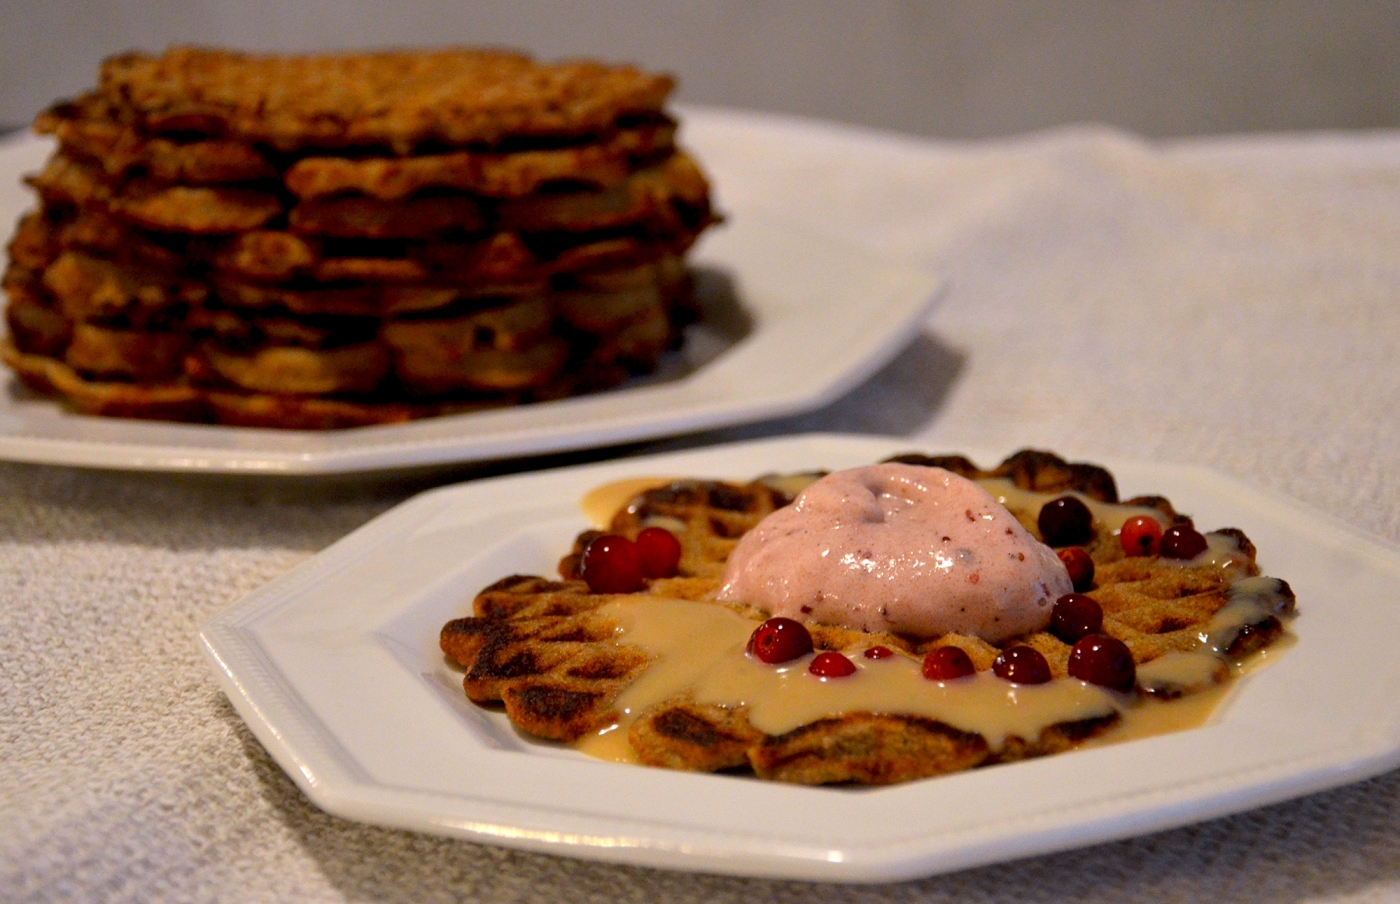 Terveelliset piparivohvelit, puolukkapehmis ja maapähkinäkinuski - Healthy Gingerbread Waffles, Lingonberry Nice Cream and Peanut Butter Fudge Sauce / Sweets by Sini